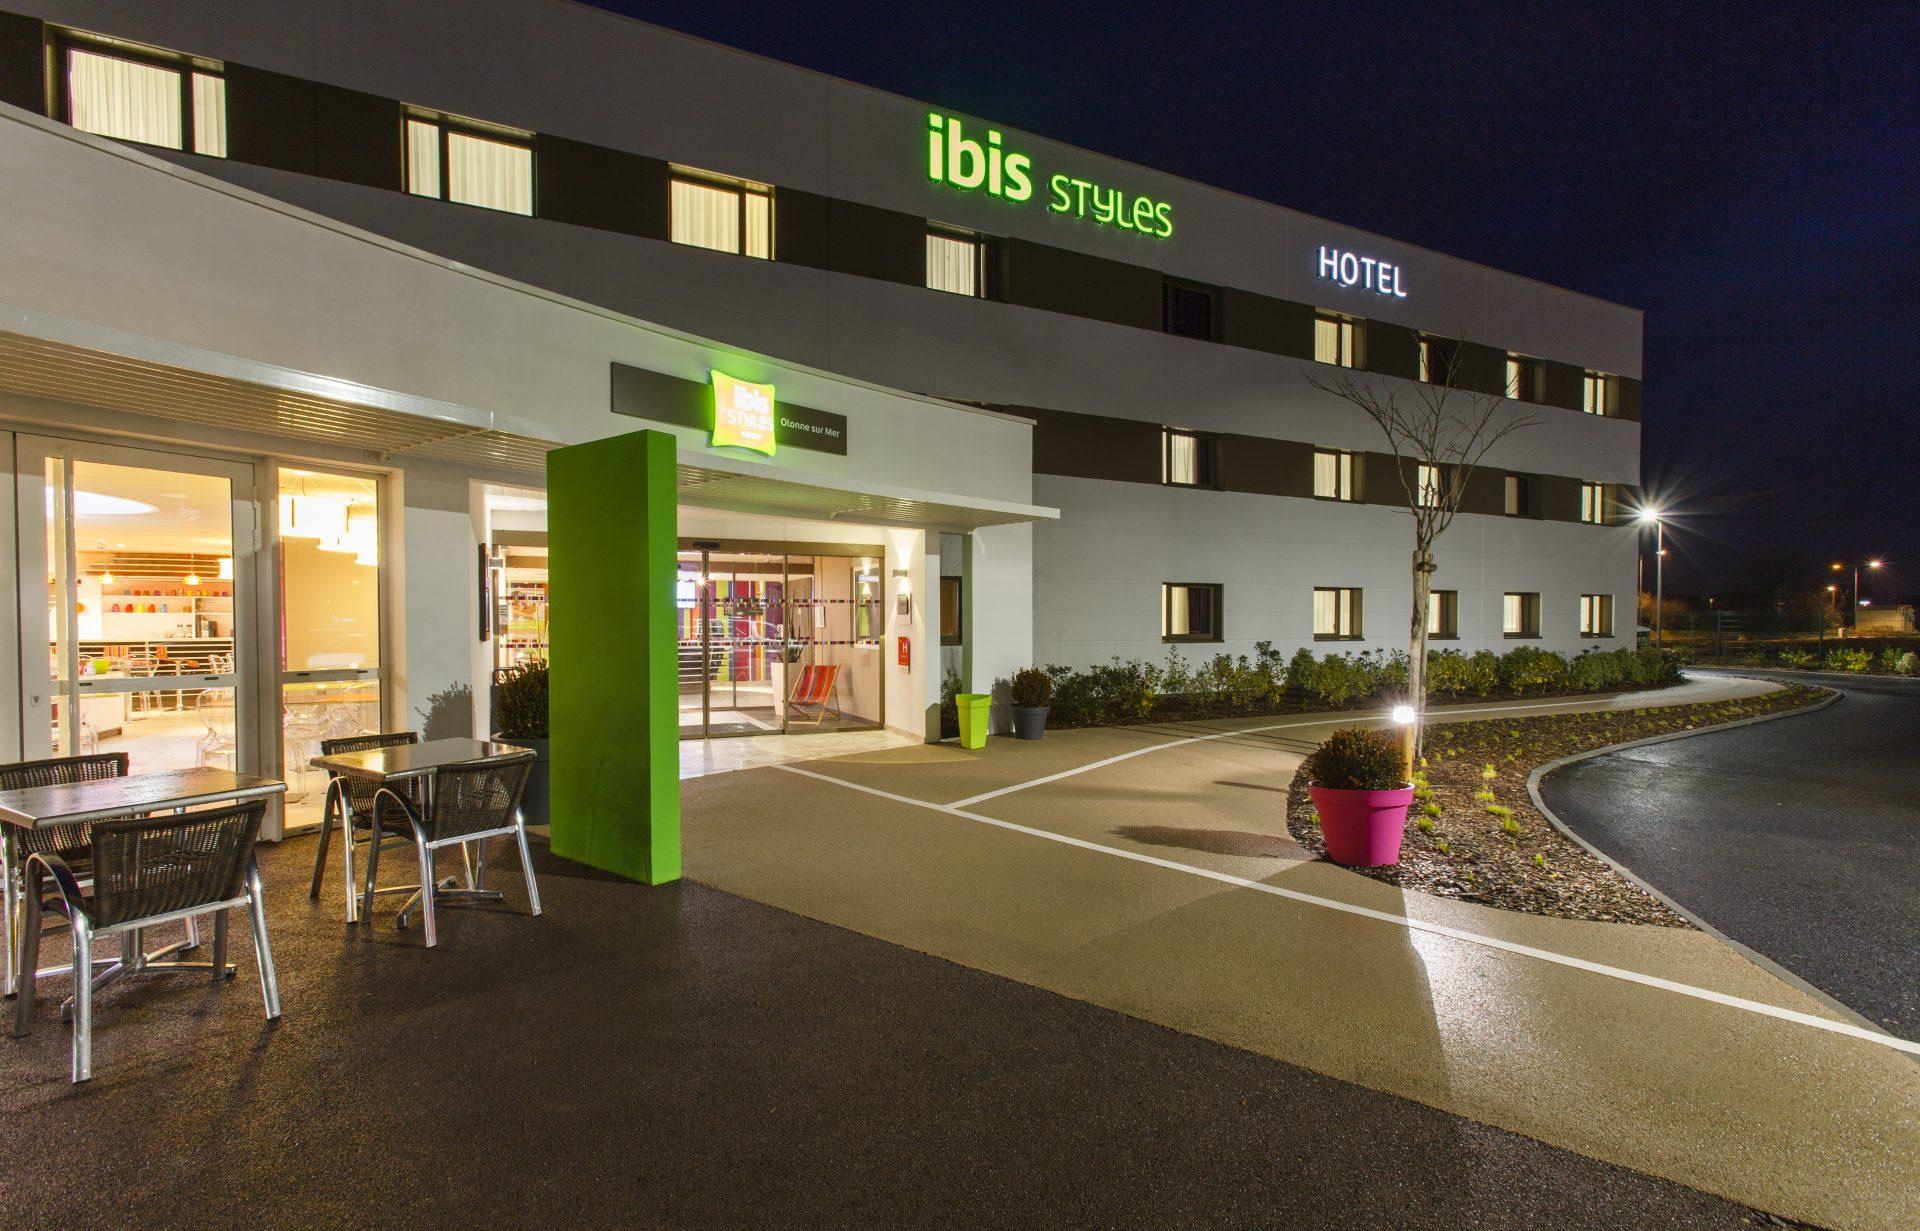 Hôtel Ibis style